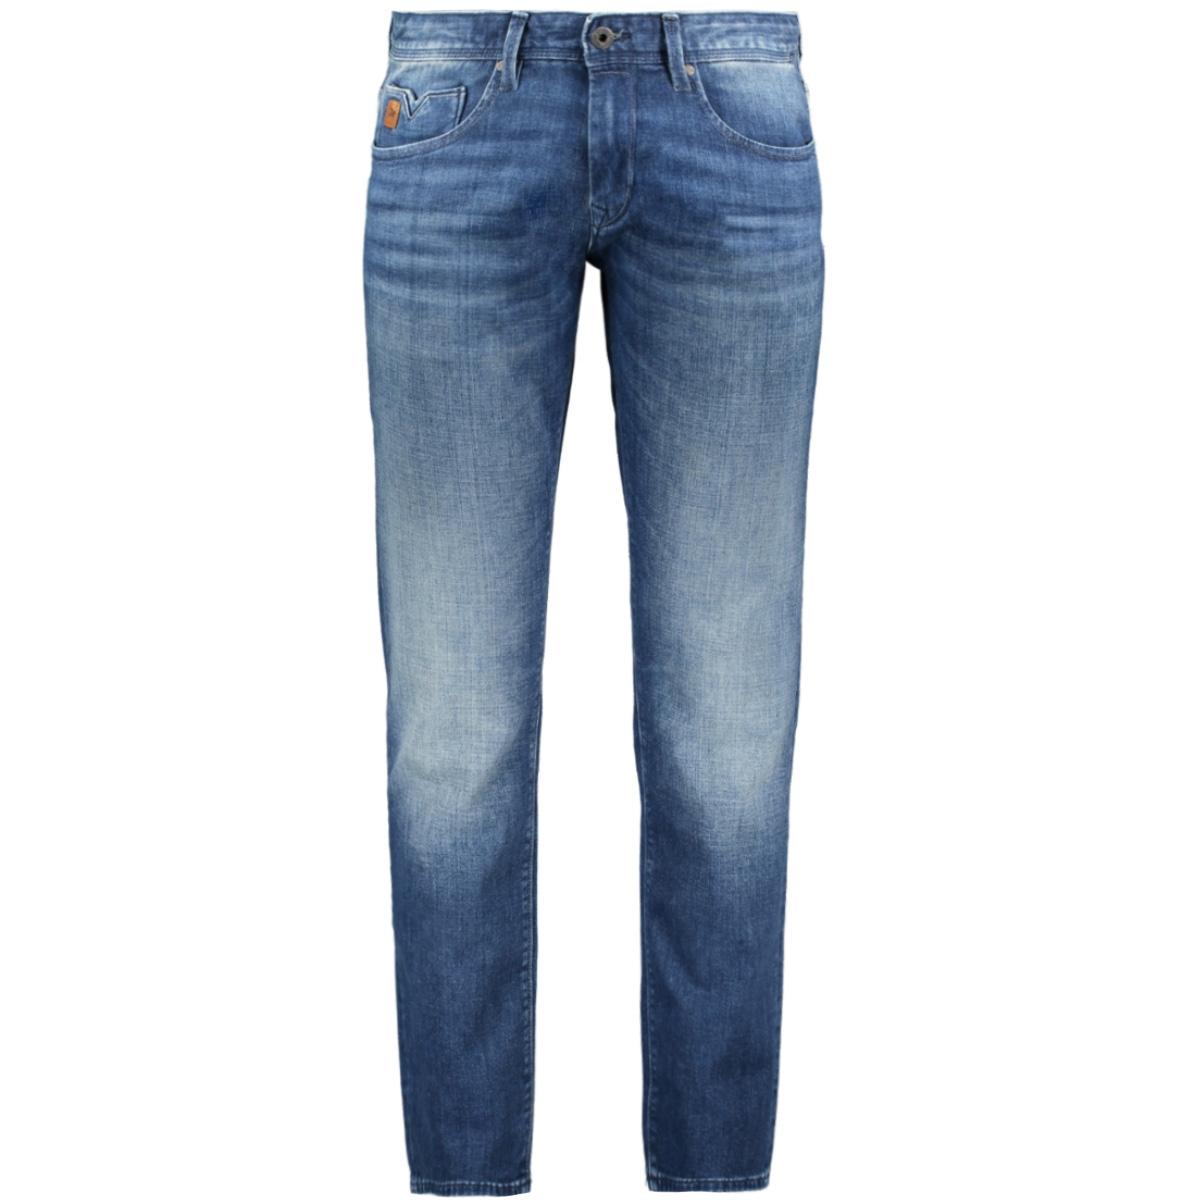 v7 rider vtr515 vanguard jeans nbe